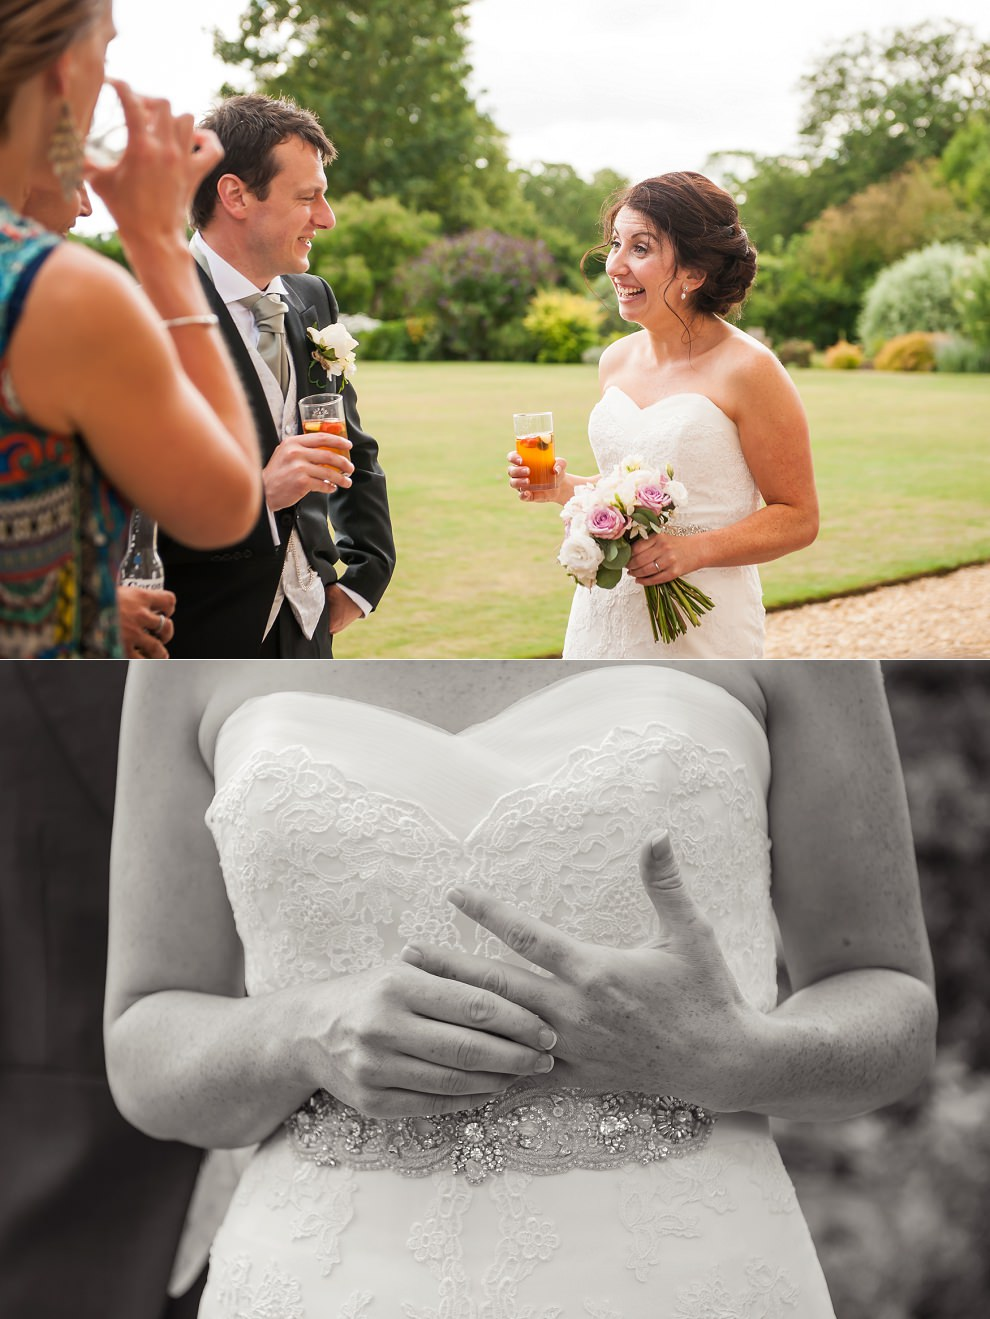 Hinwick-House-Wedding-Katie-Adam-15